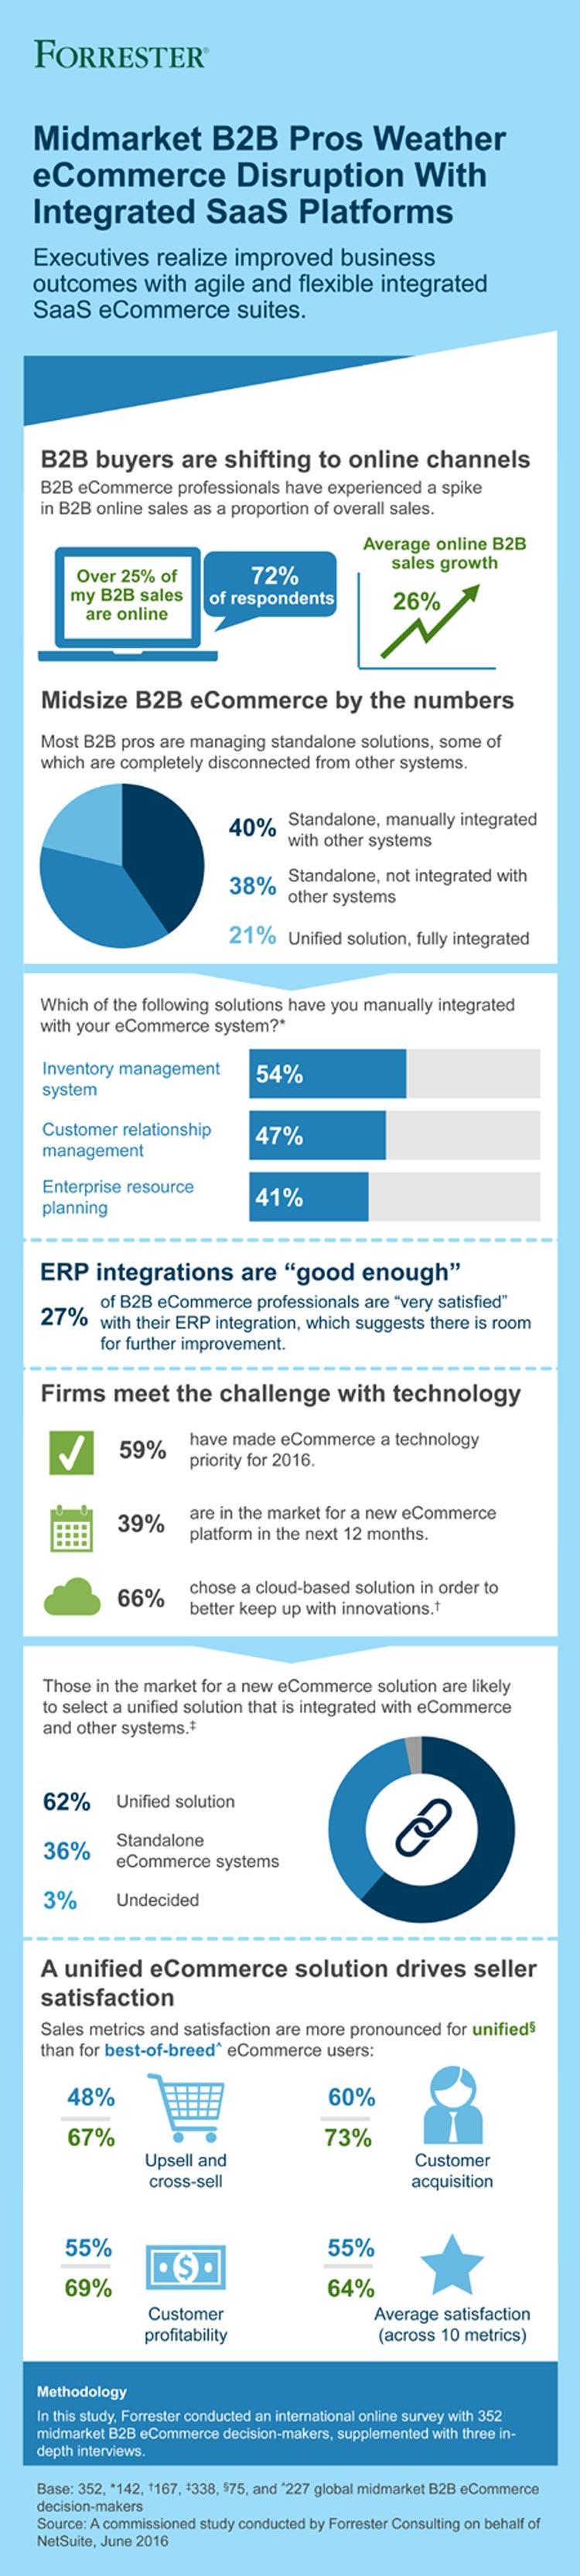 B2B Ecommerce Midmarket Infographic